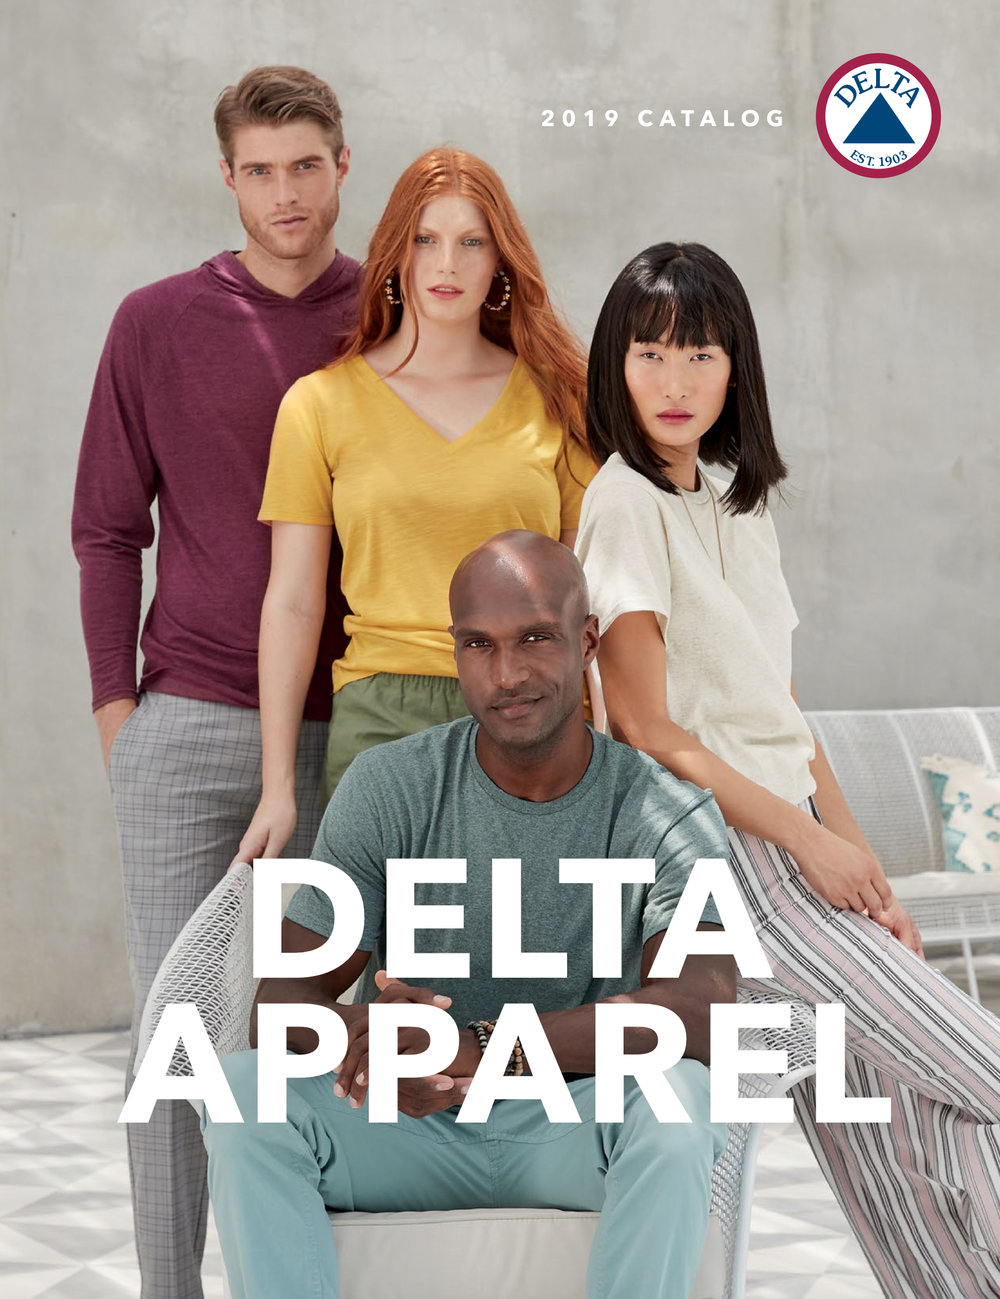 delta copy.jpg